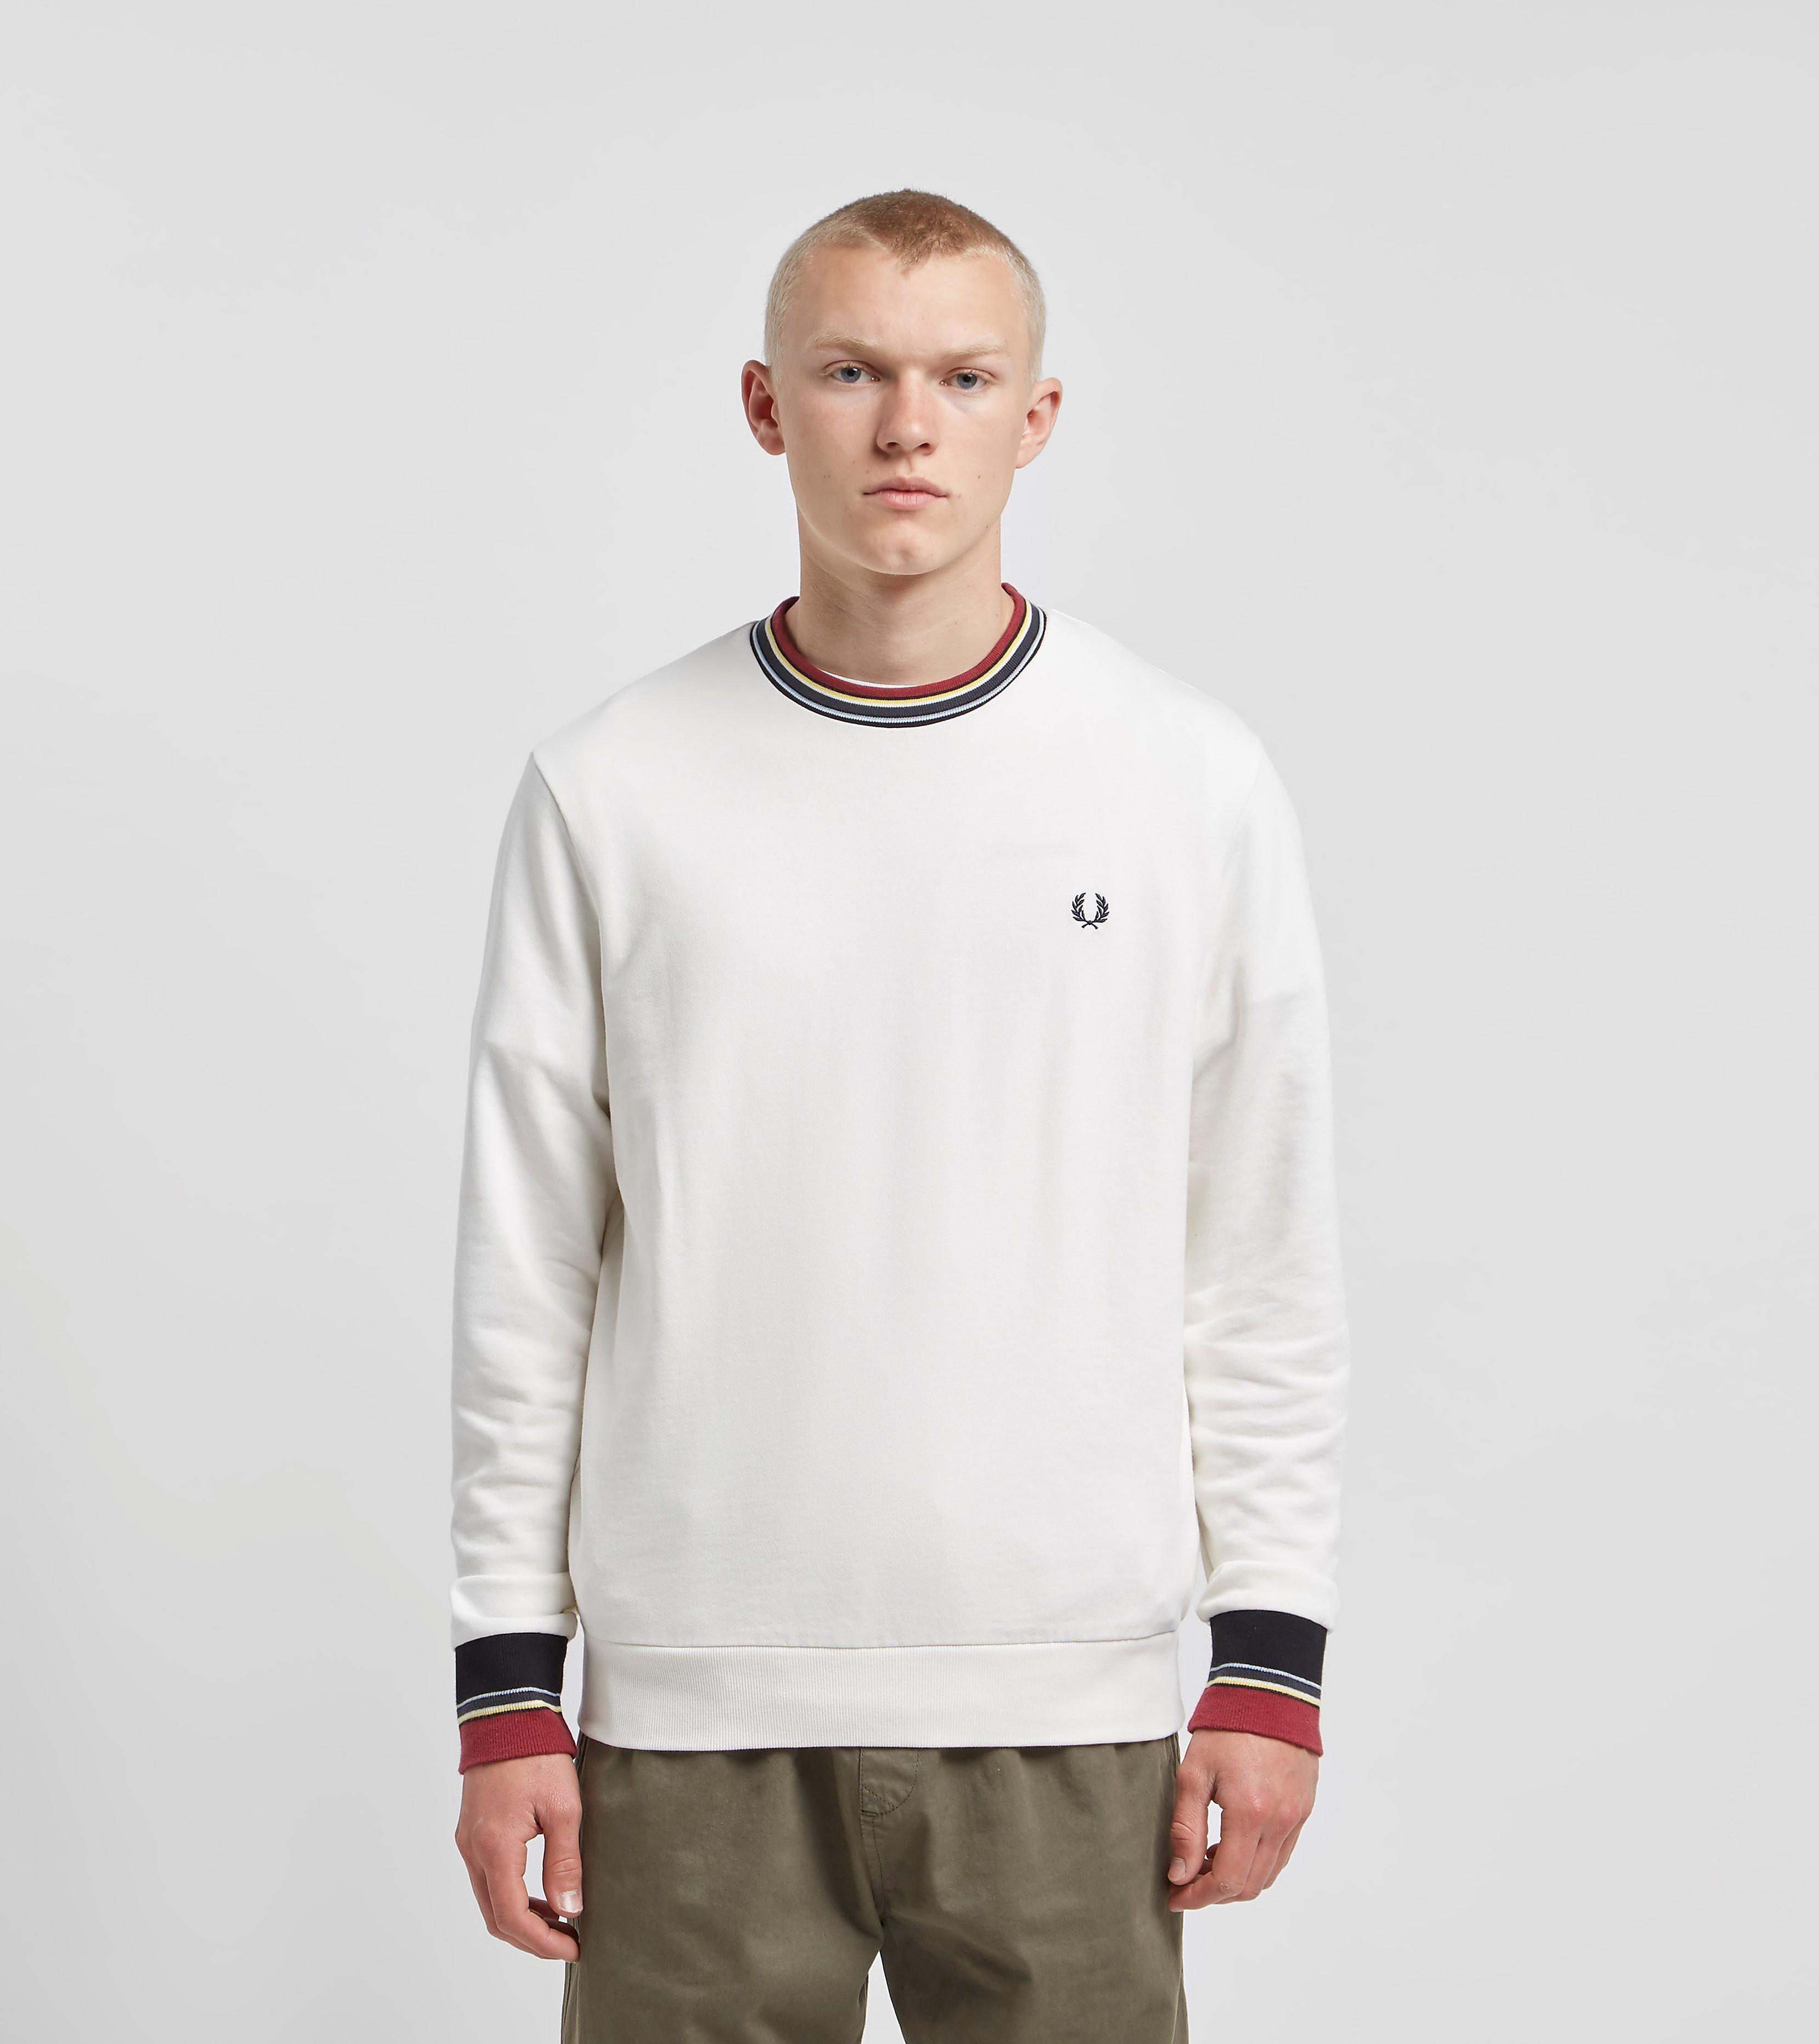 Fred Perry Striped Trim Sweatshirt White